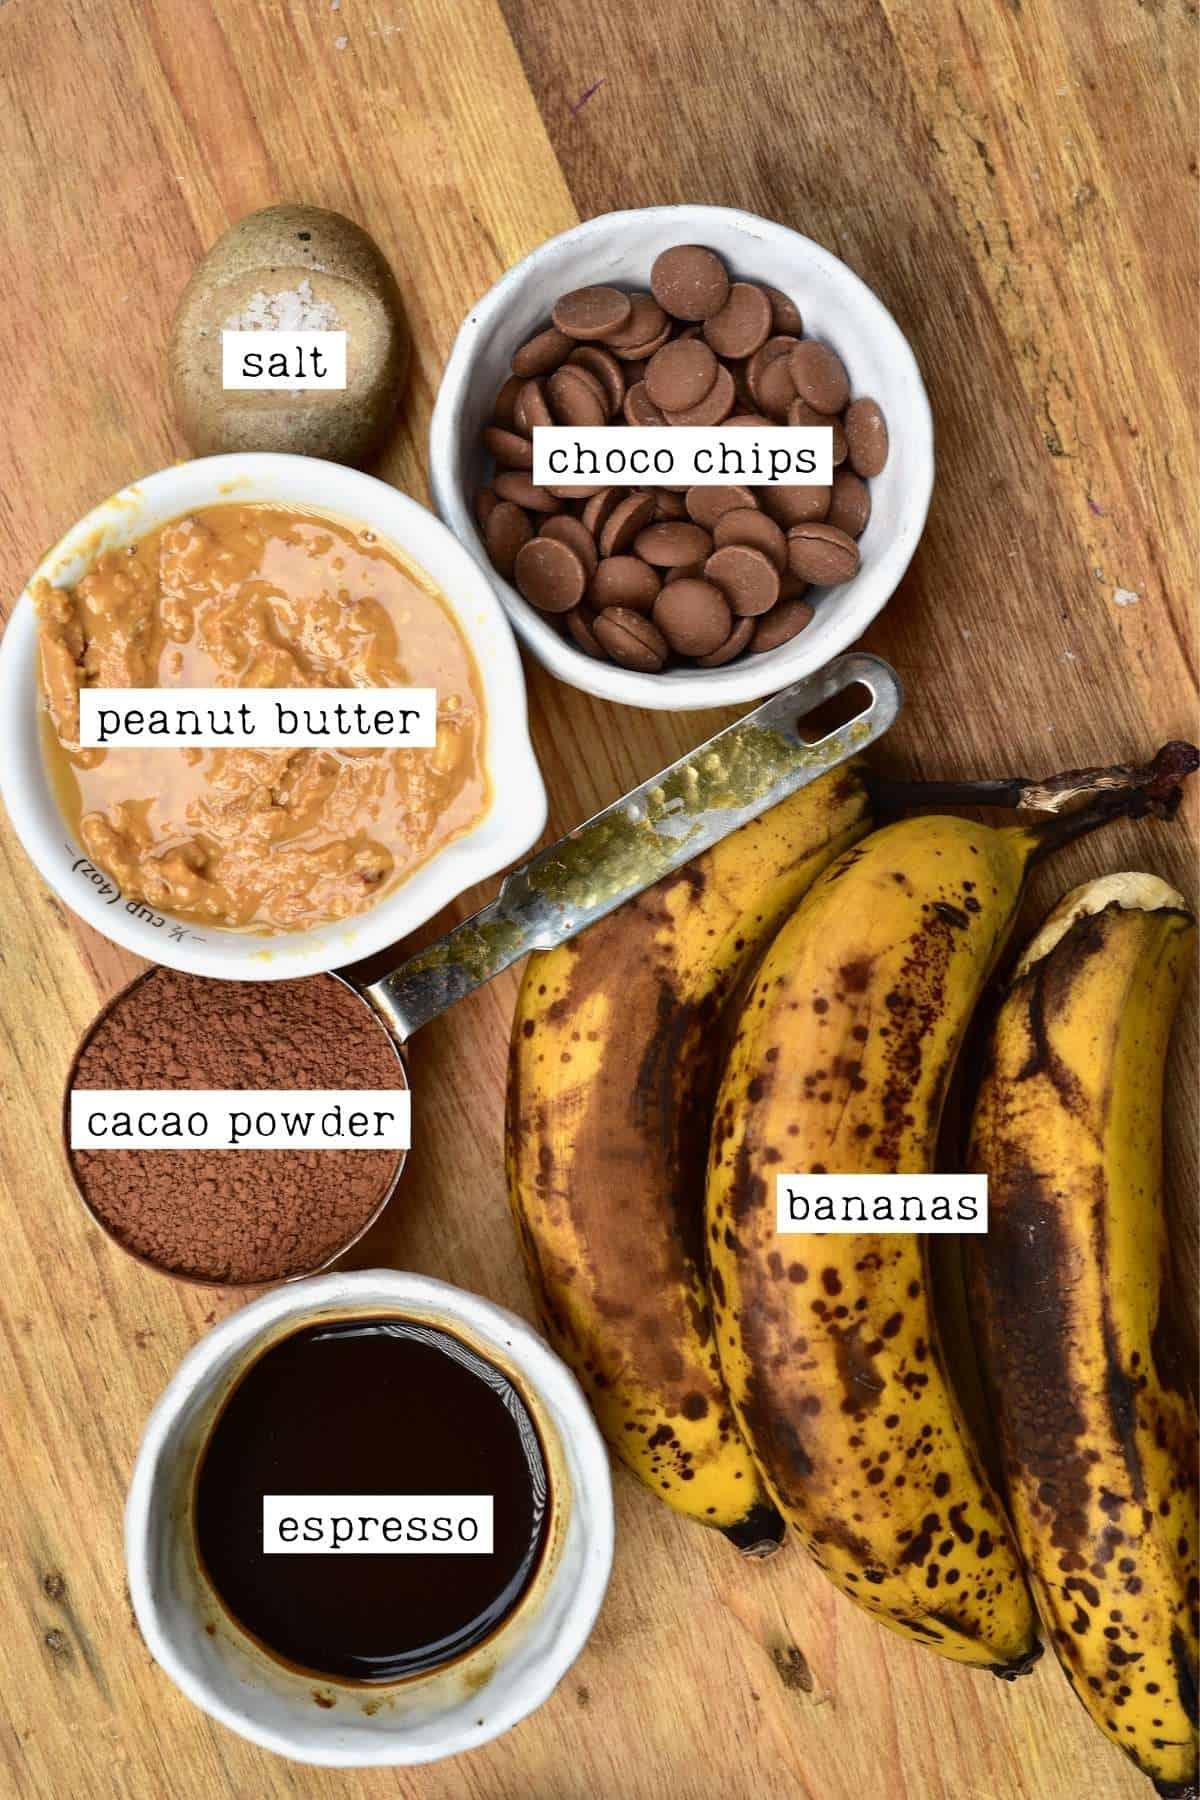 Ingredients for banana brownies